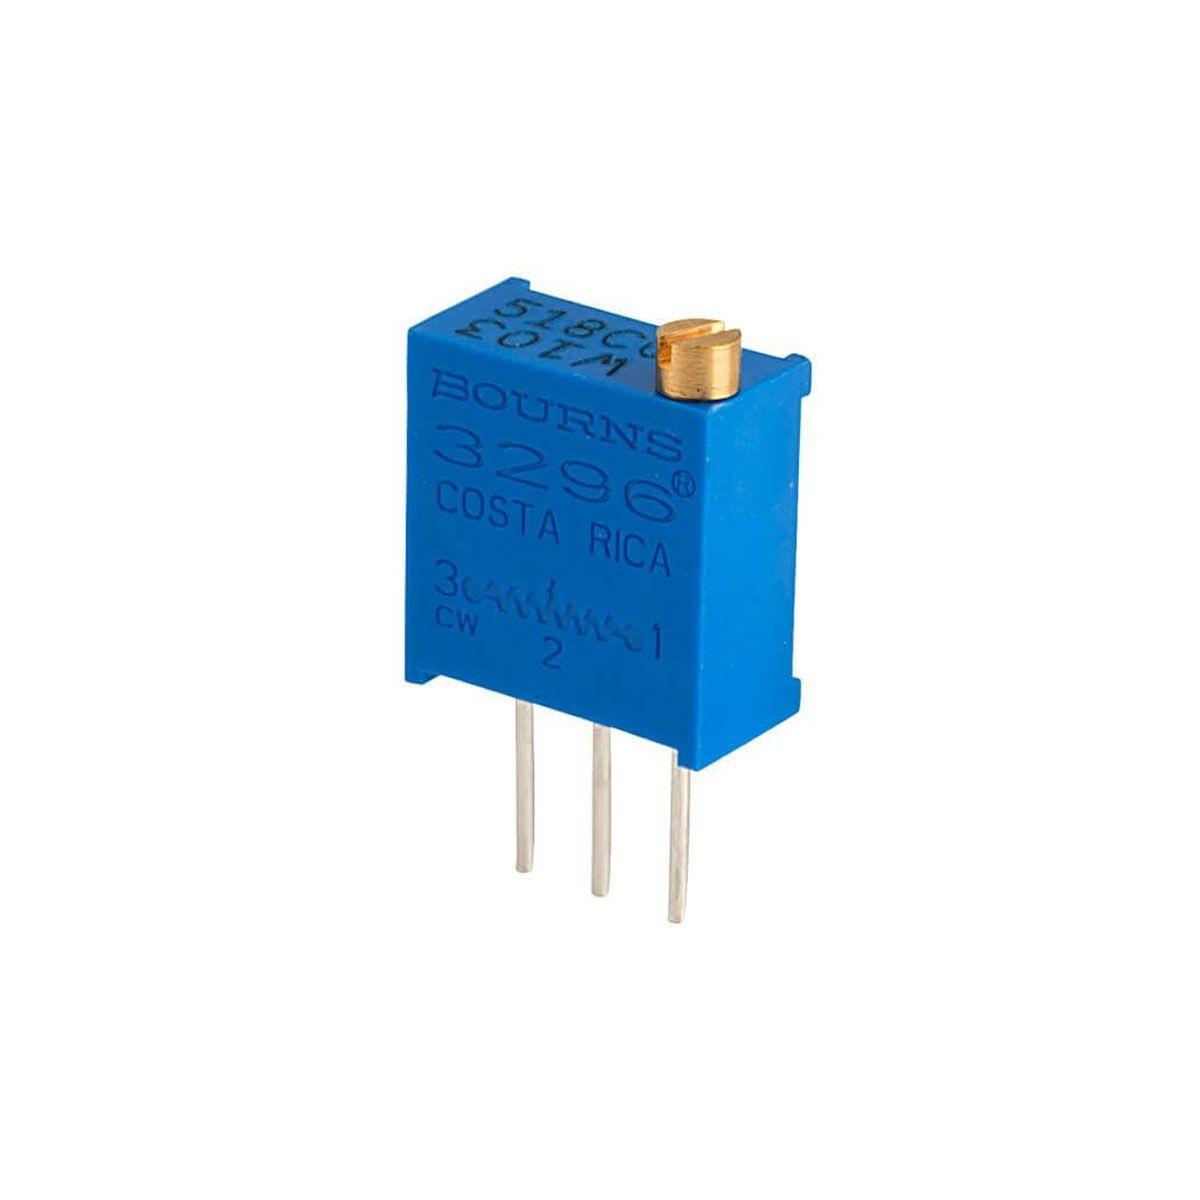 3x Trimpot / Potenciômetro Multivoltas 10K - Vertical